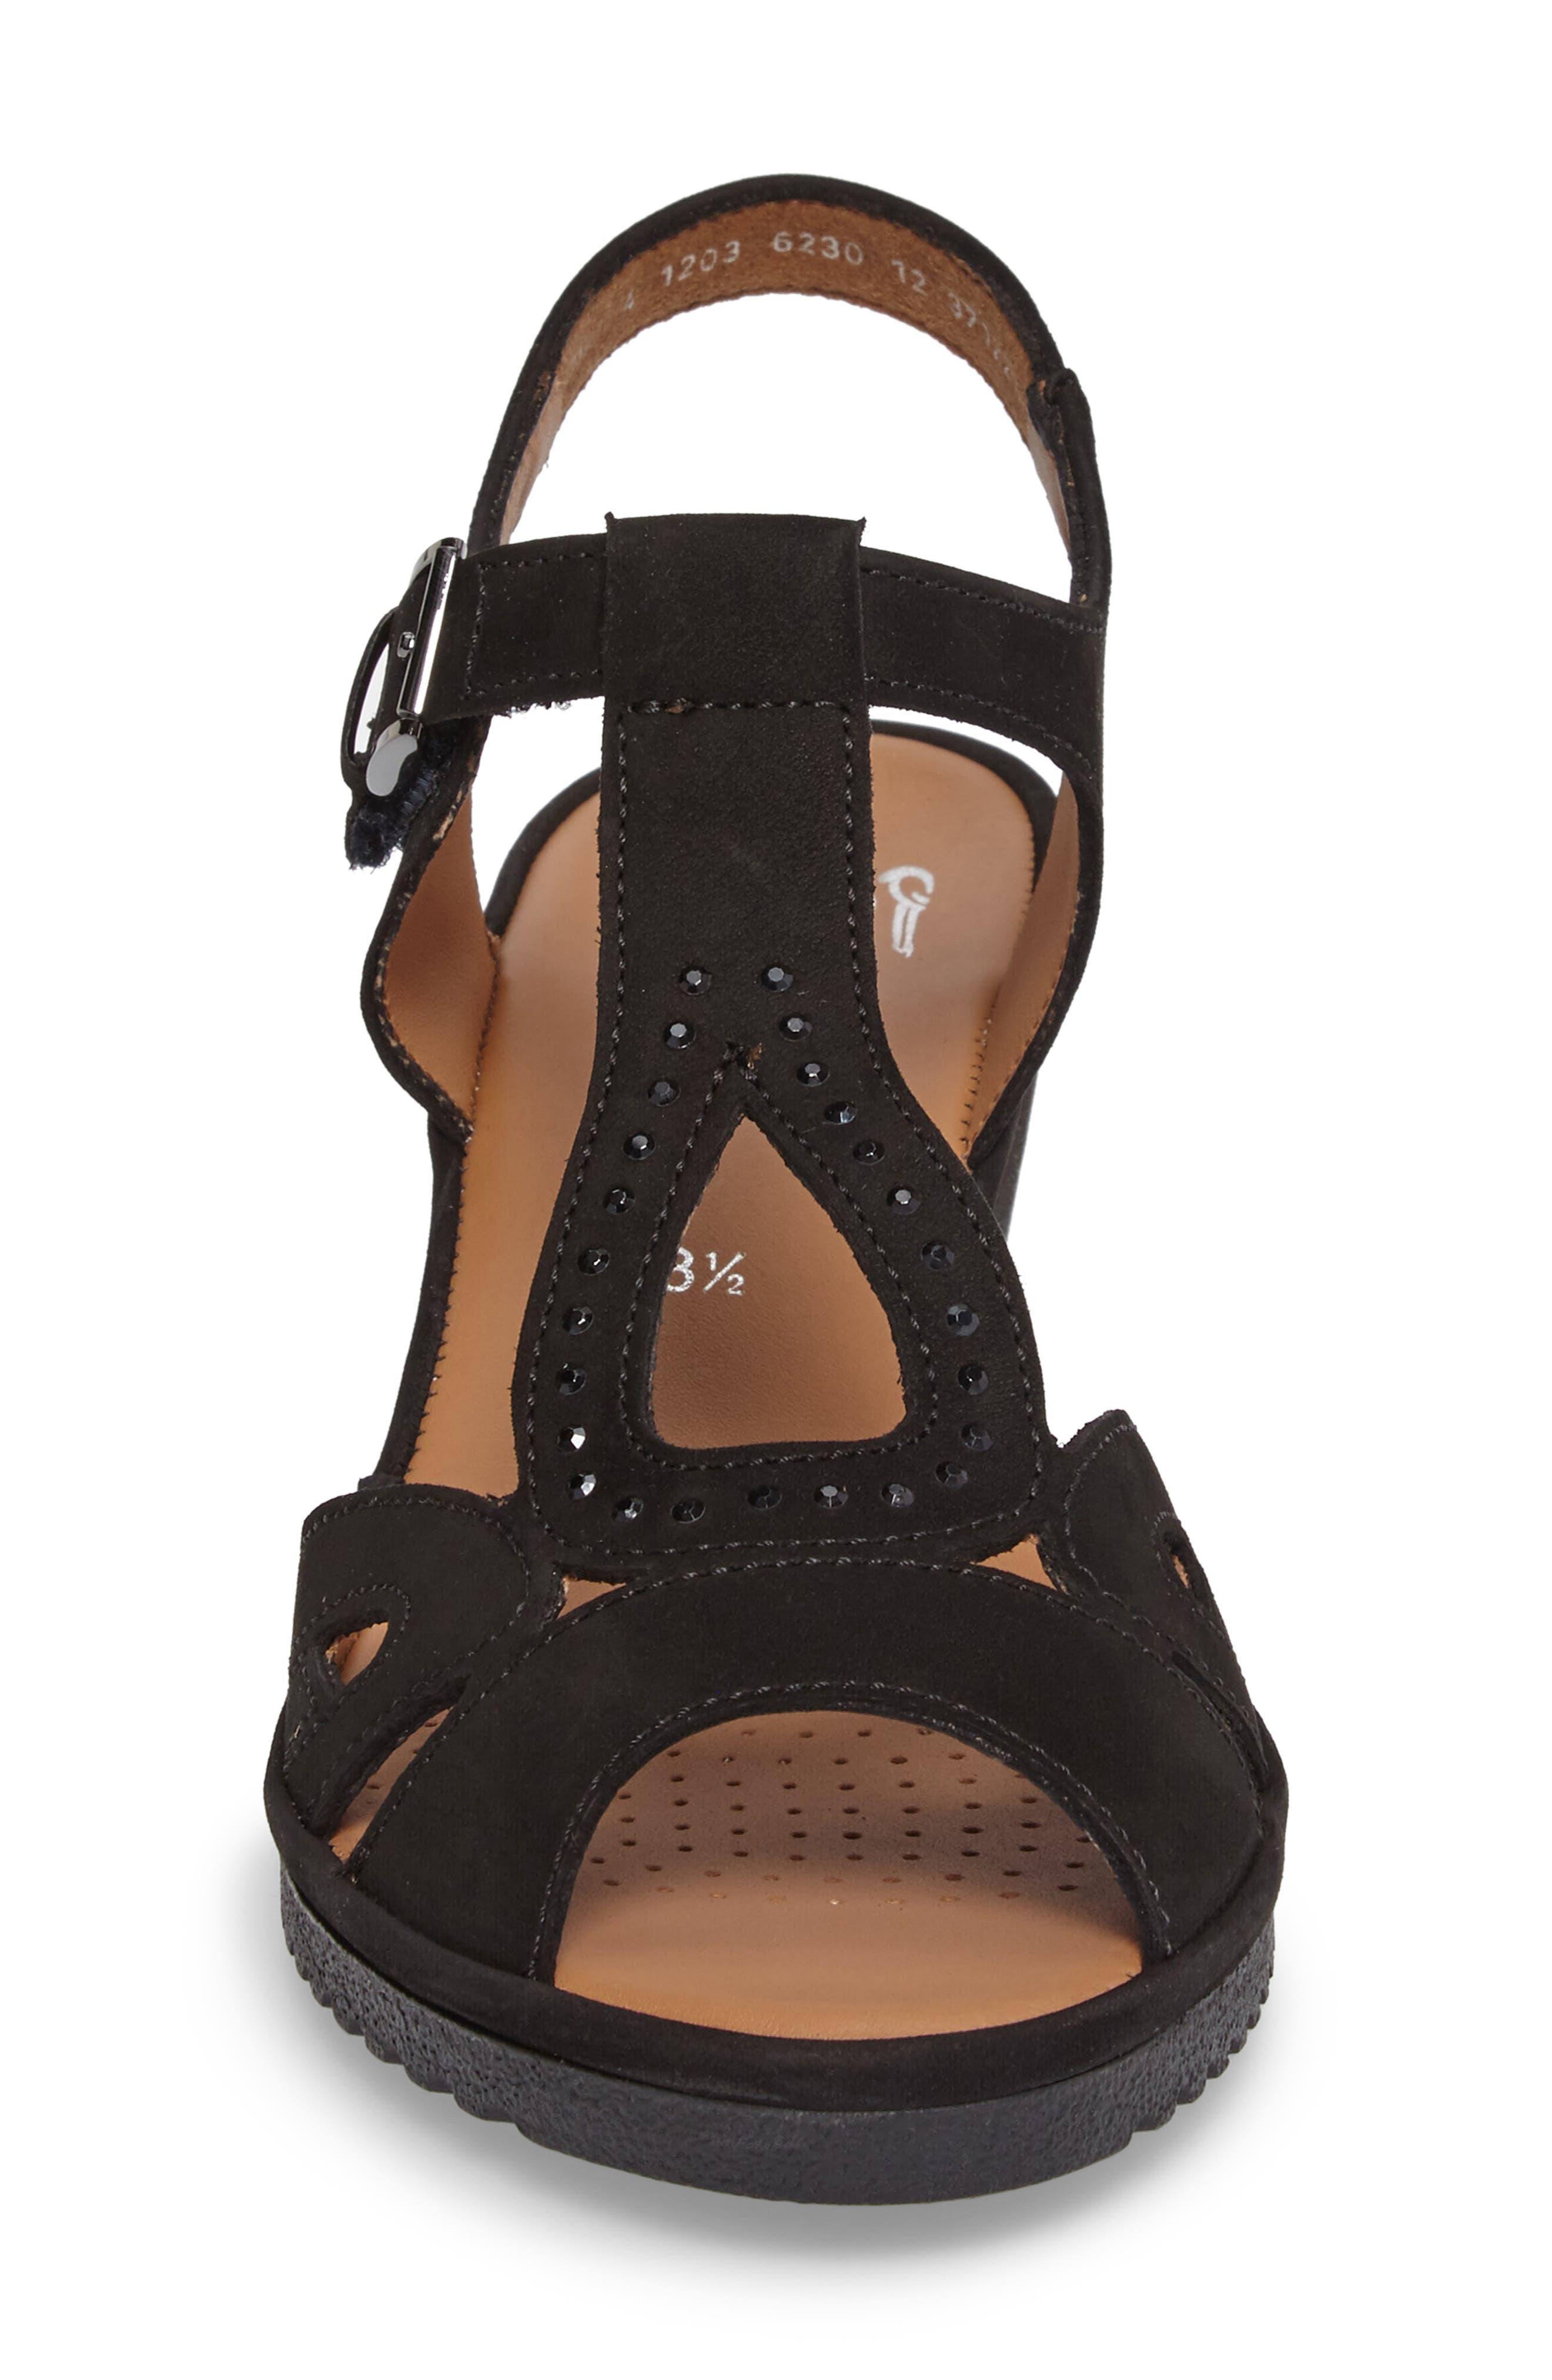 Wedge Sandal,                             Alternate thumbnail 4, color,                             Black